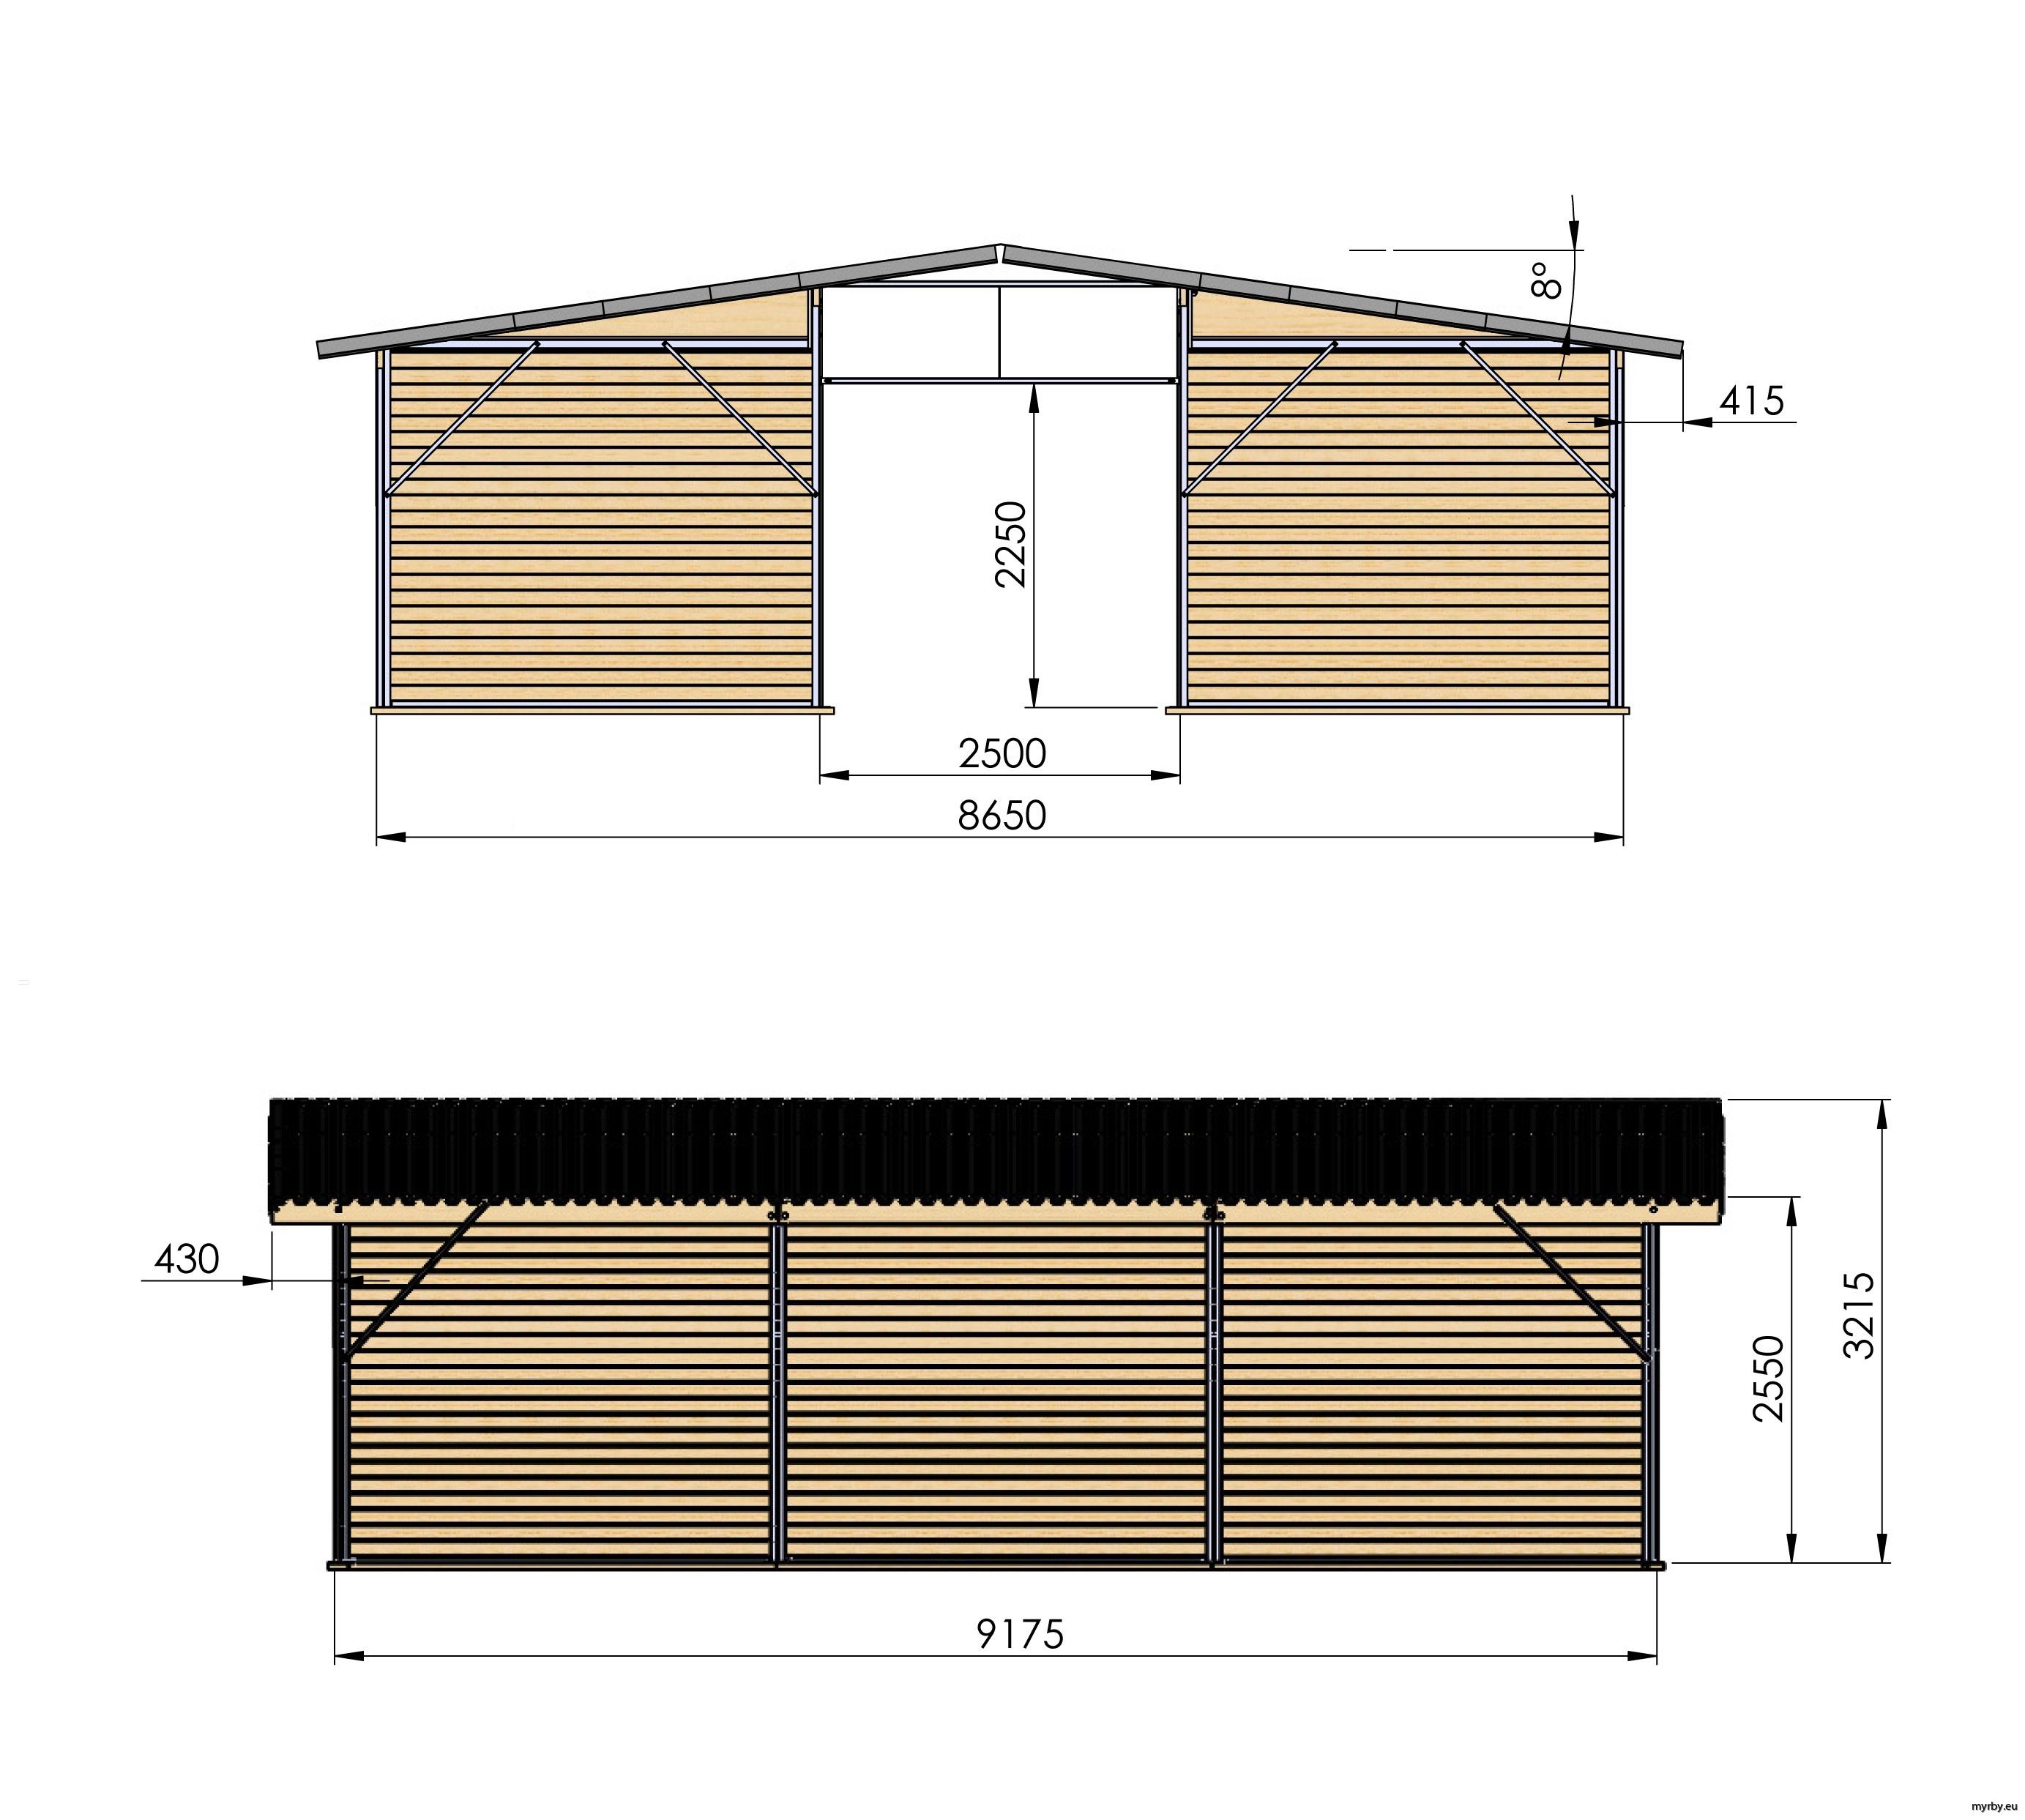 14208-17 Ligghall 78 m² Mått